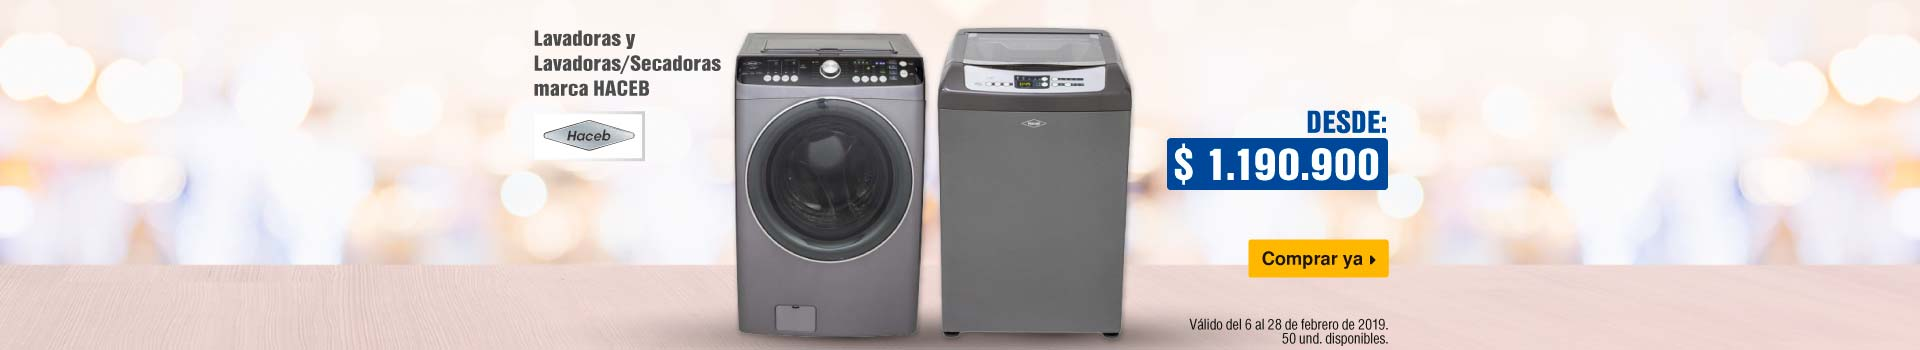 AK-KT-mayores-3-1-ELECT-BCAT-lavadoras-050219